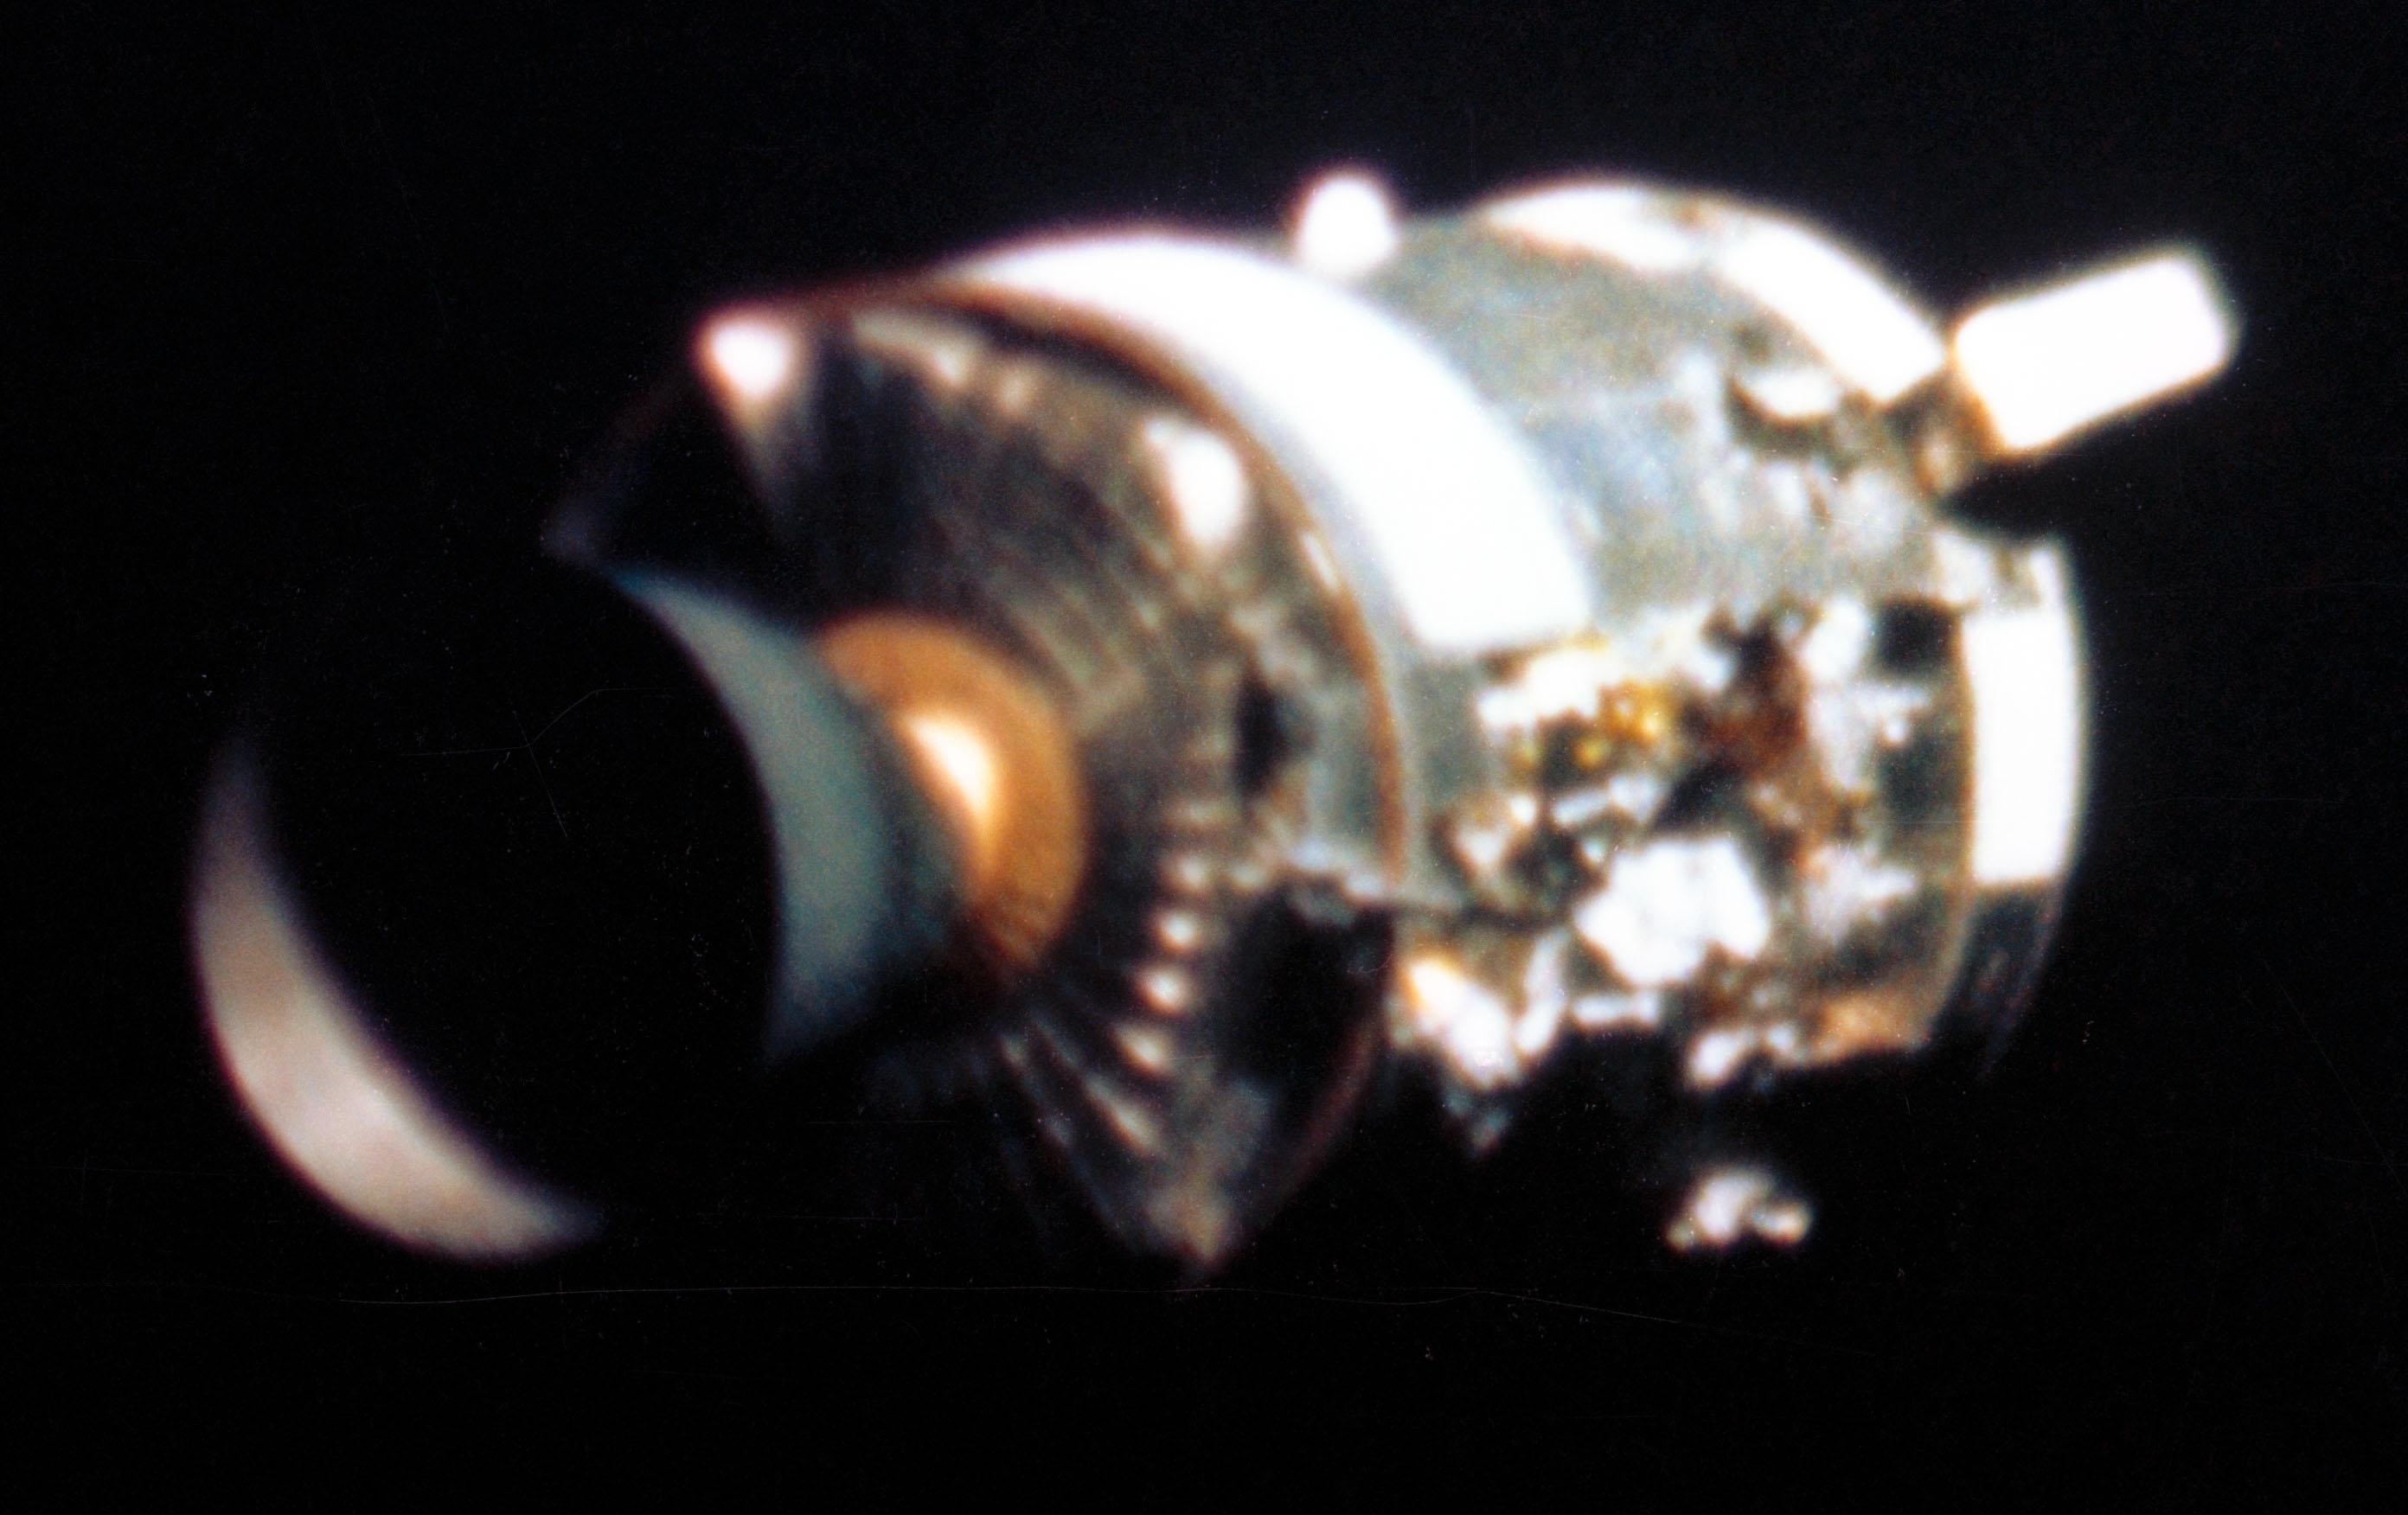 Apollo 13 - Krabbeninvasie